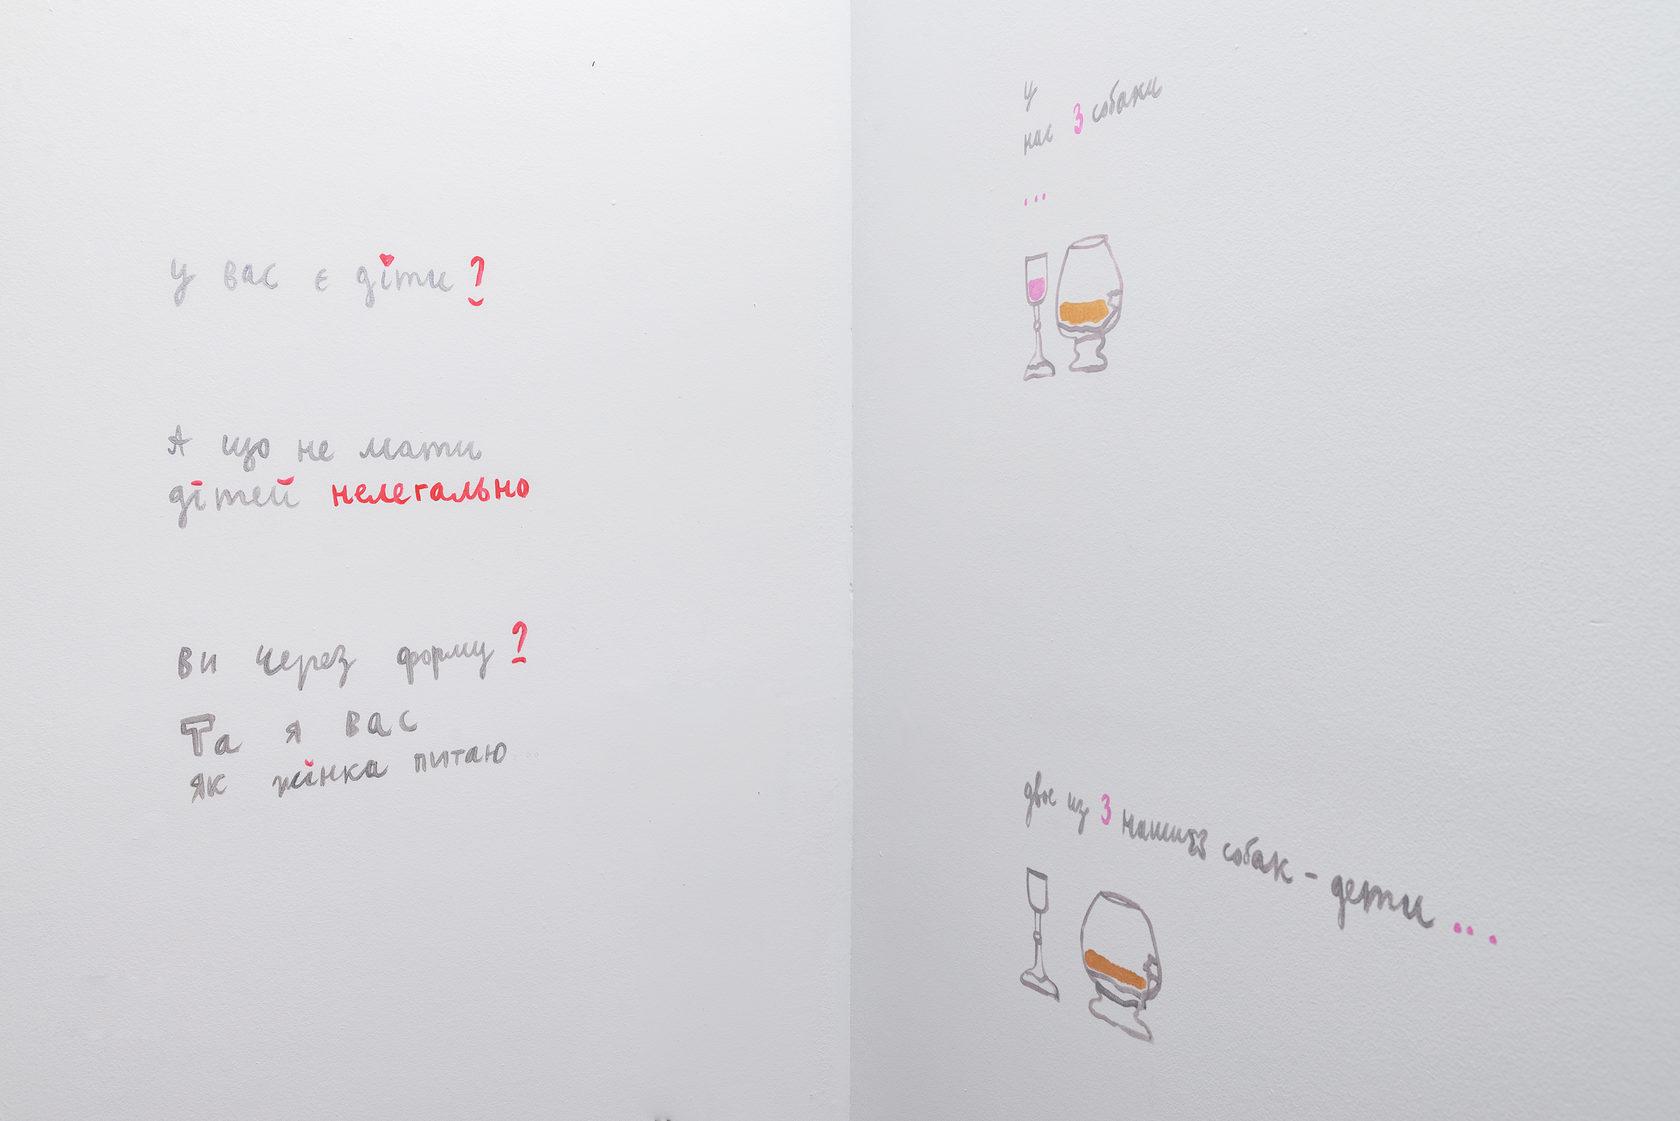 Алевтина Кахідзе. 44, 2018 (фрагмент)